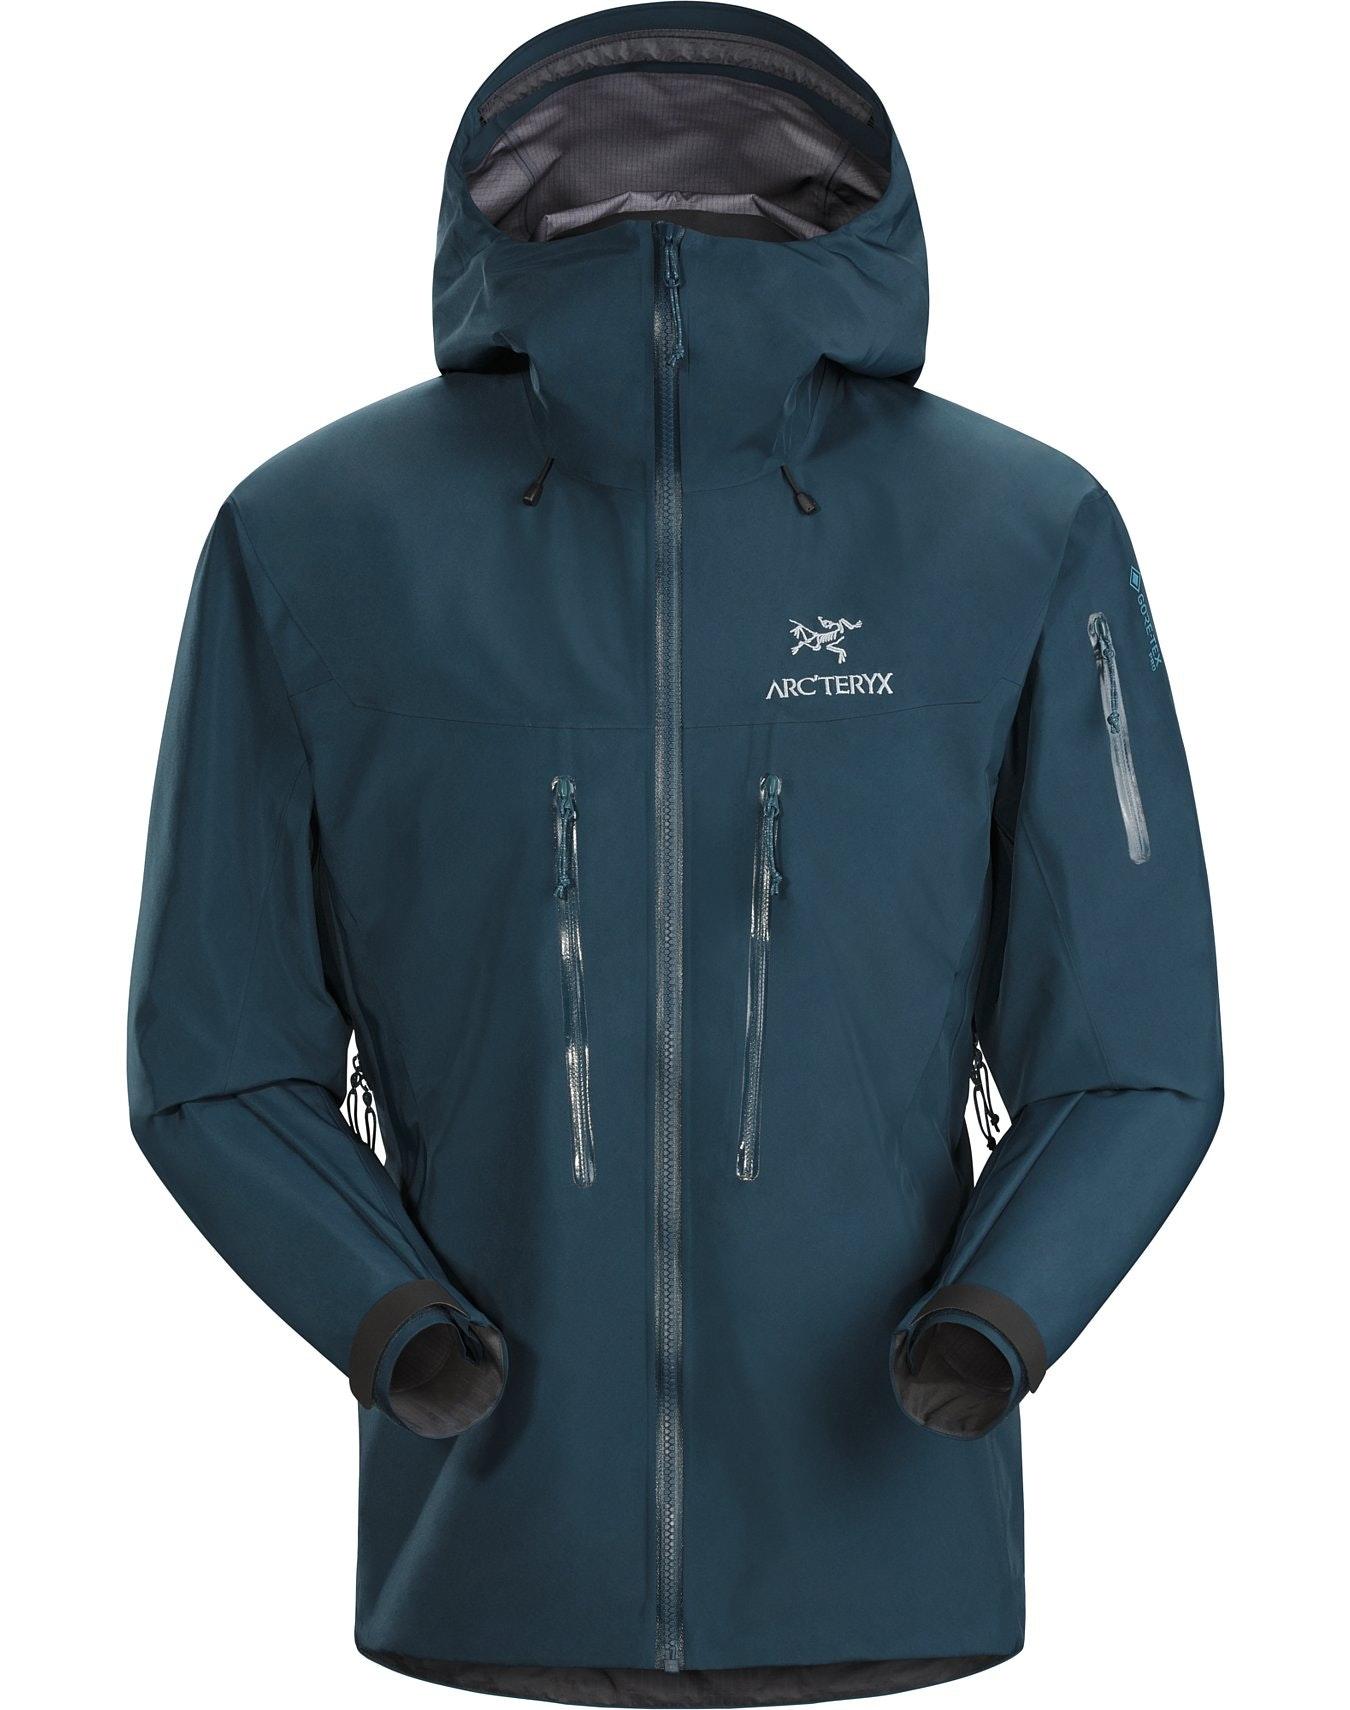 Arc'teryx Alpha SV M's jakke på nett | Hekta På Tur Hekta